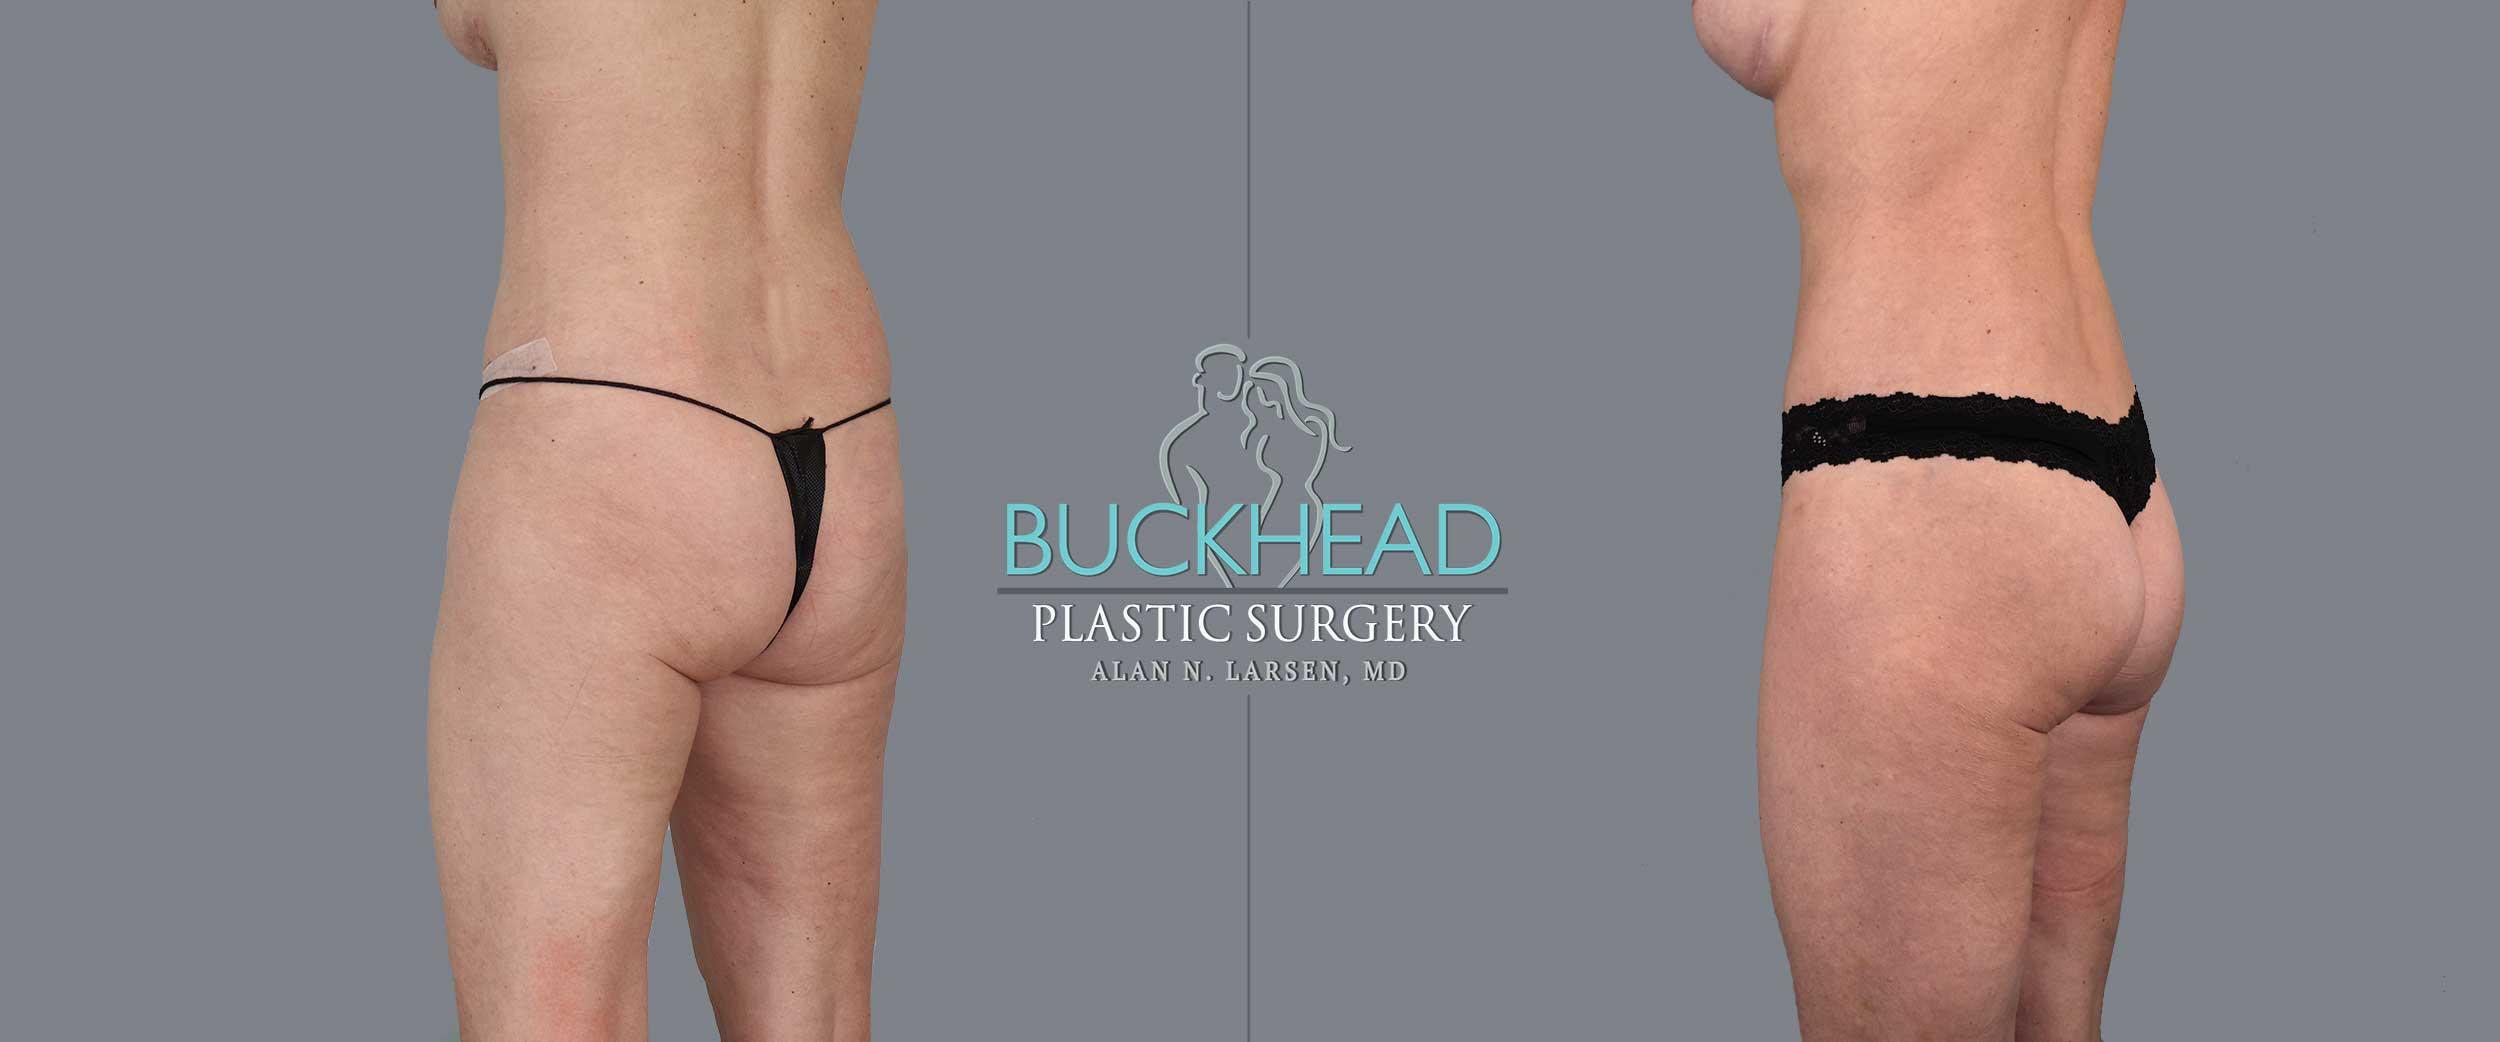 Alan N Larsen, MD, Double Board Plastic Surgeon at Buckhead Plastic Surgery